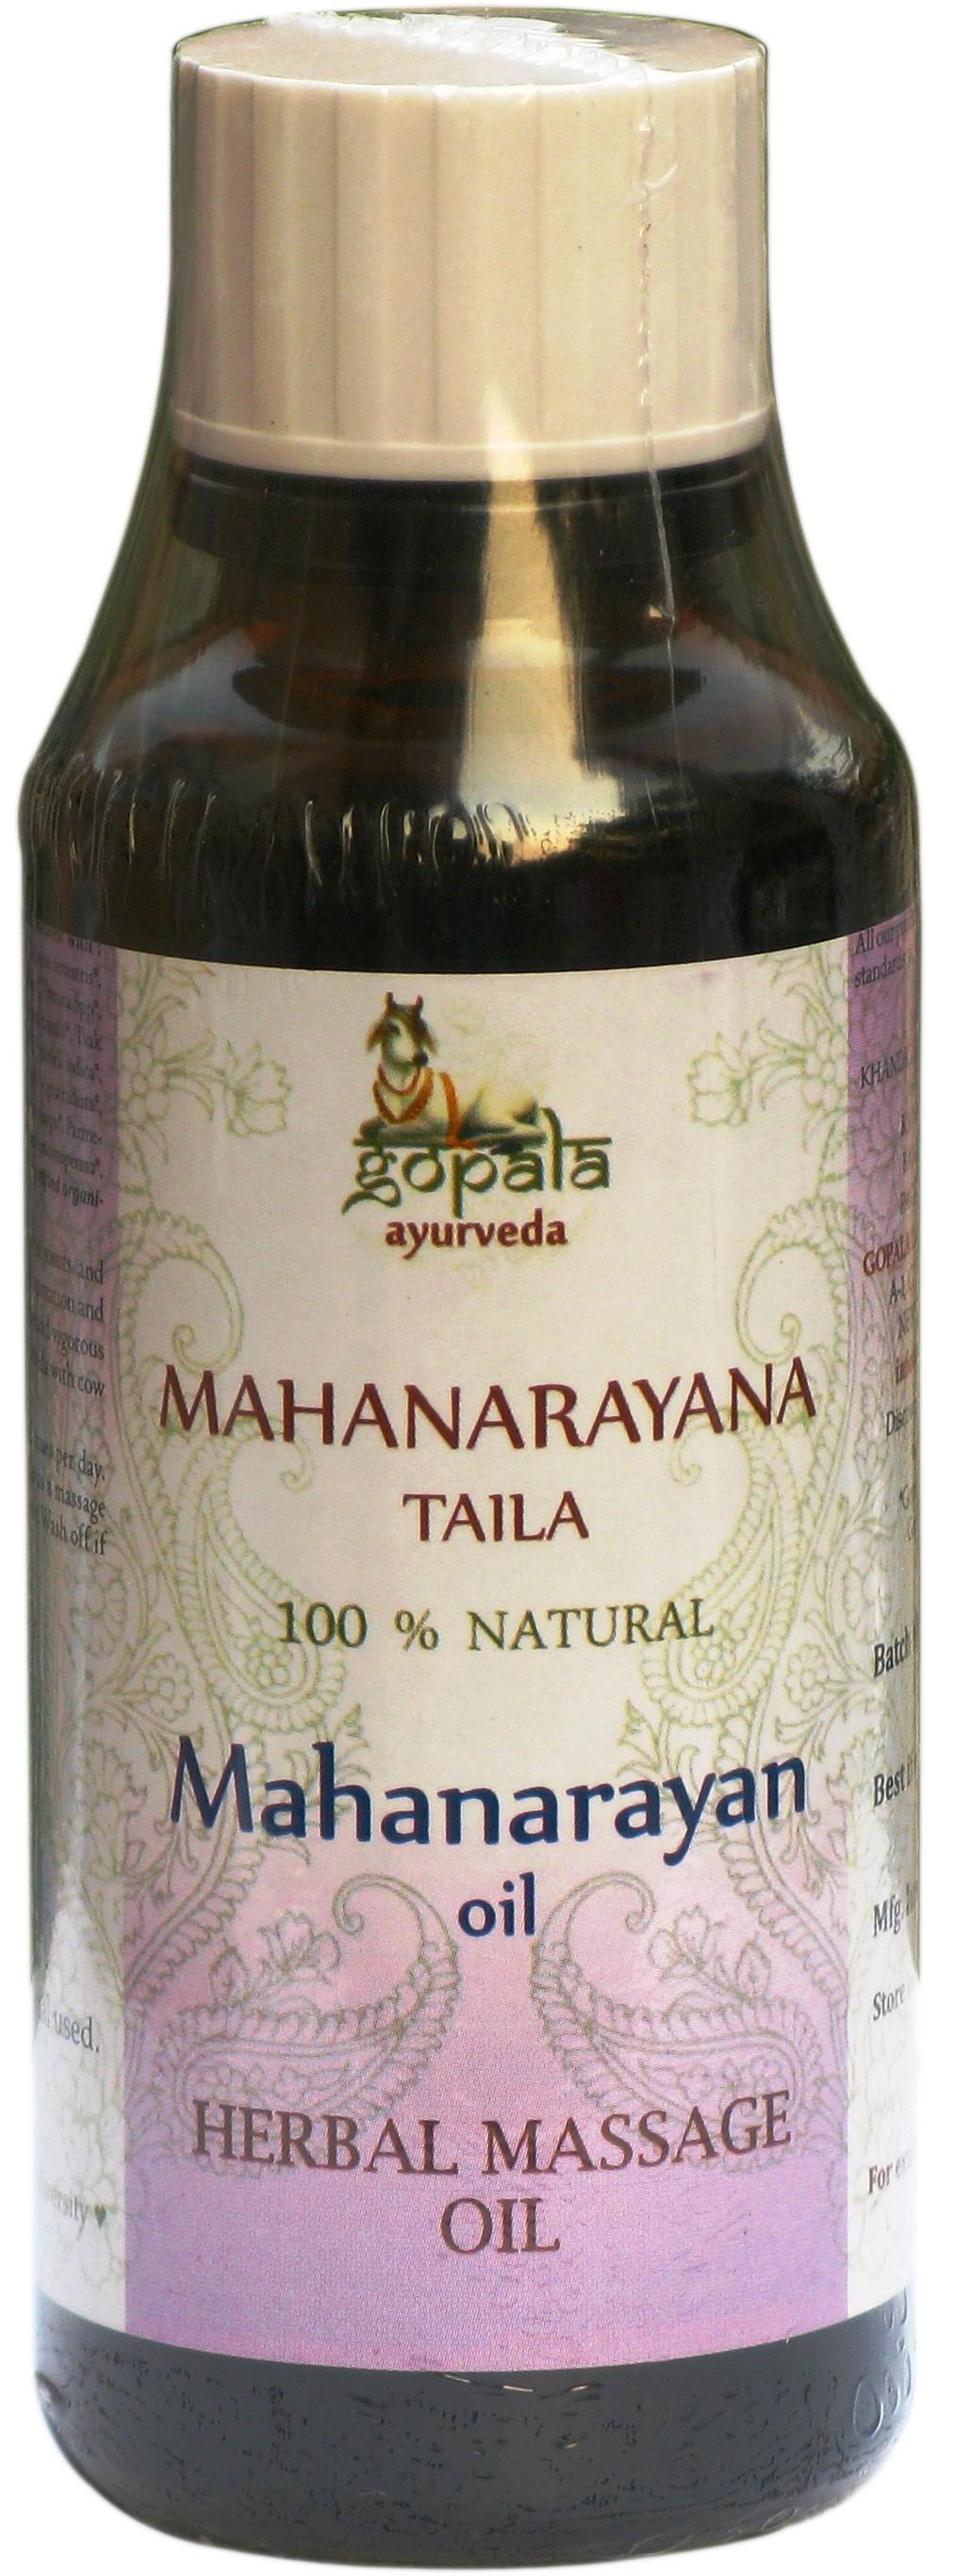 Gopala Ayurveda MAHANARAYANA taila BIO